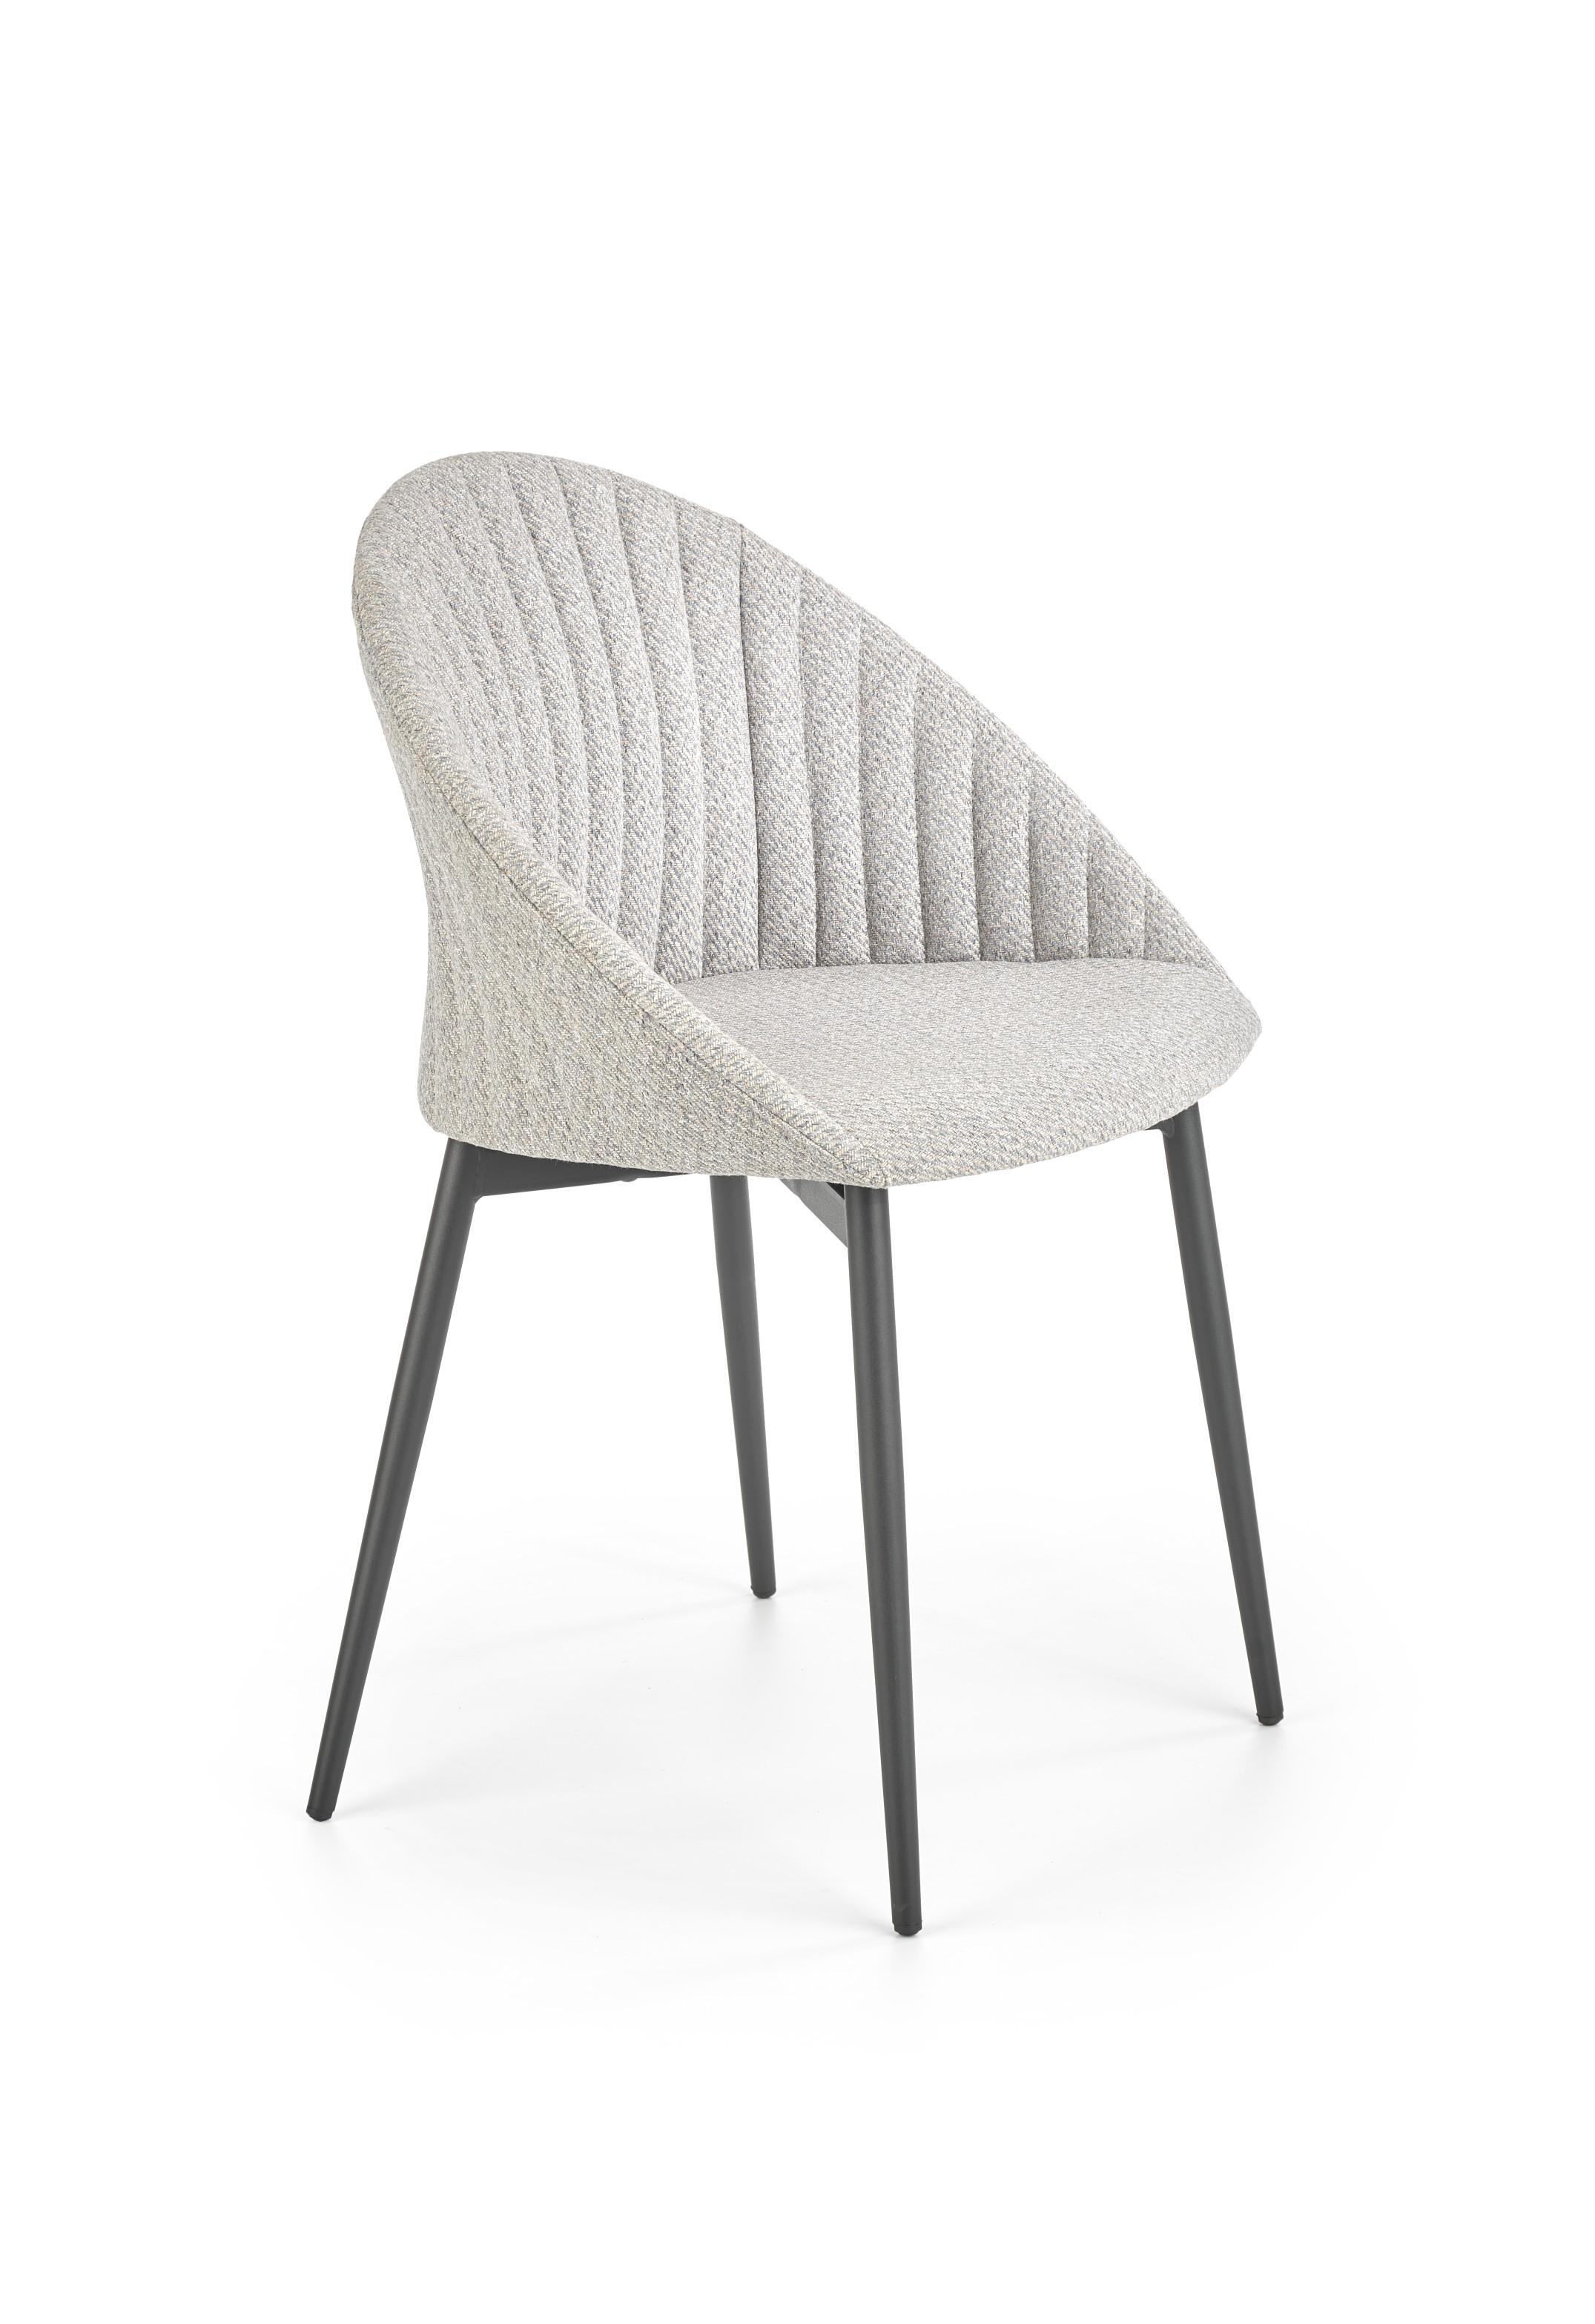 K357 jedálenská stolička svetlošedá